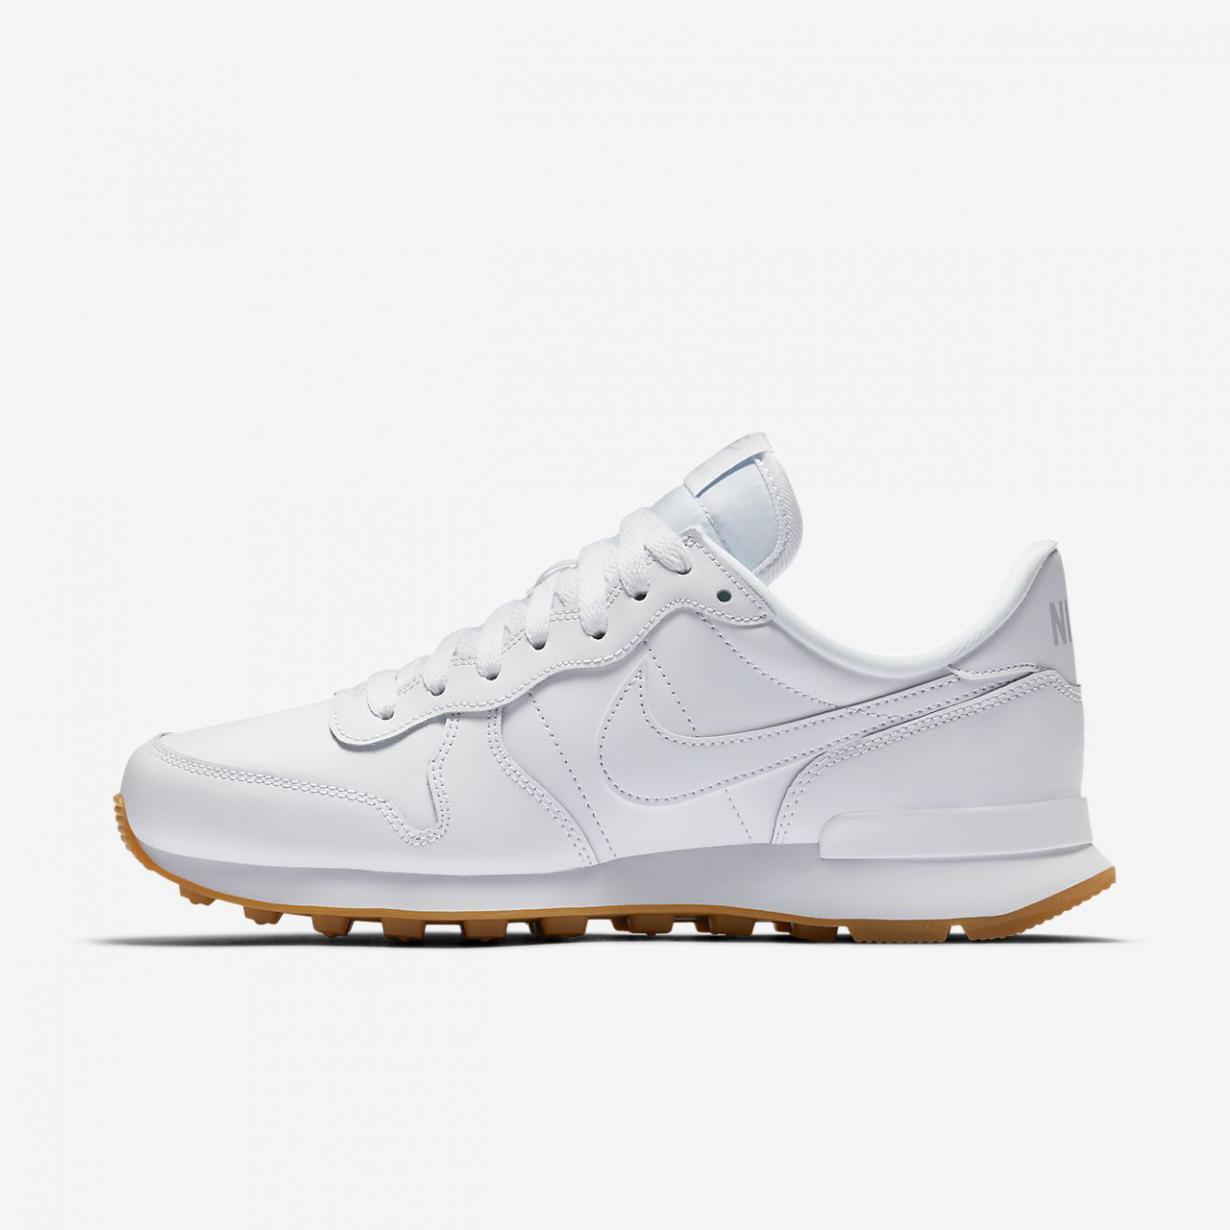 Femme < Nike Chaussures En Ligne Pas Cher Boutique < Gooddaytricities